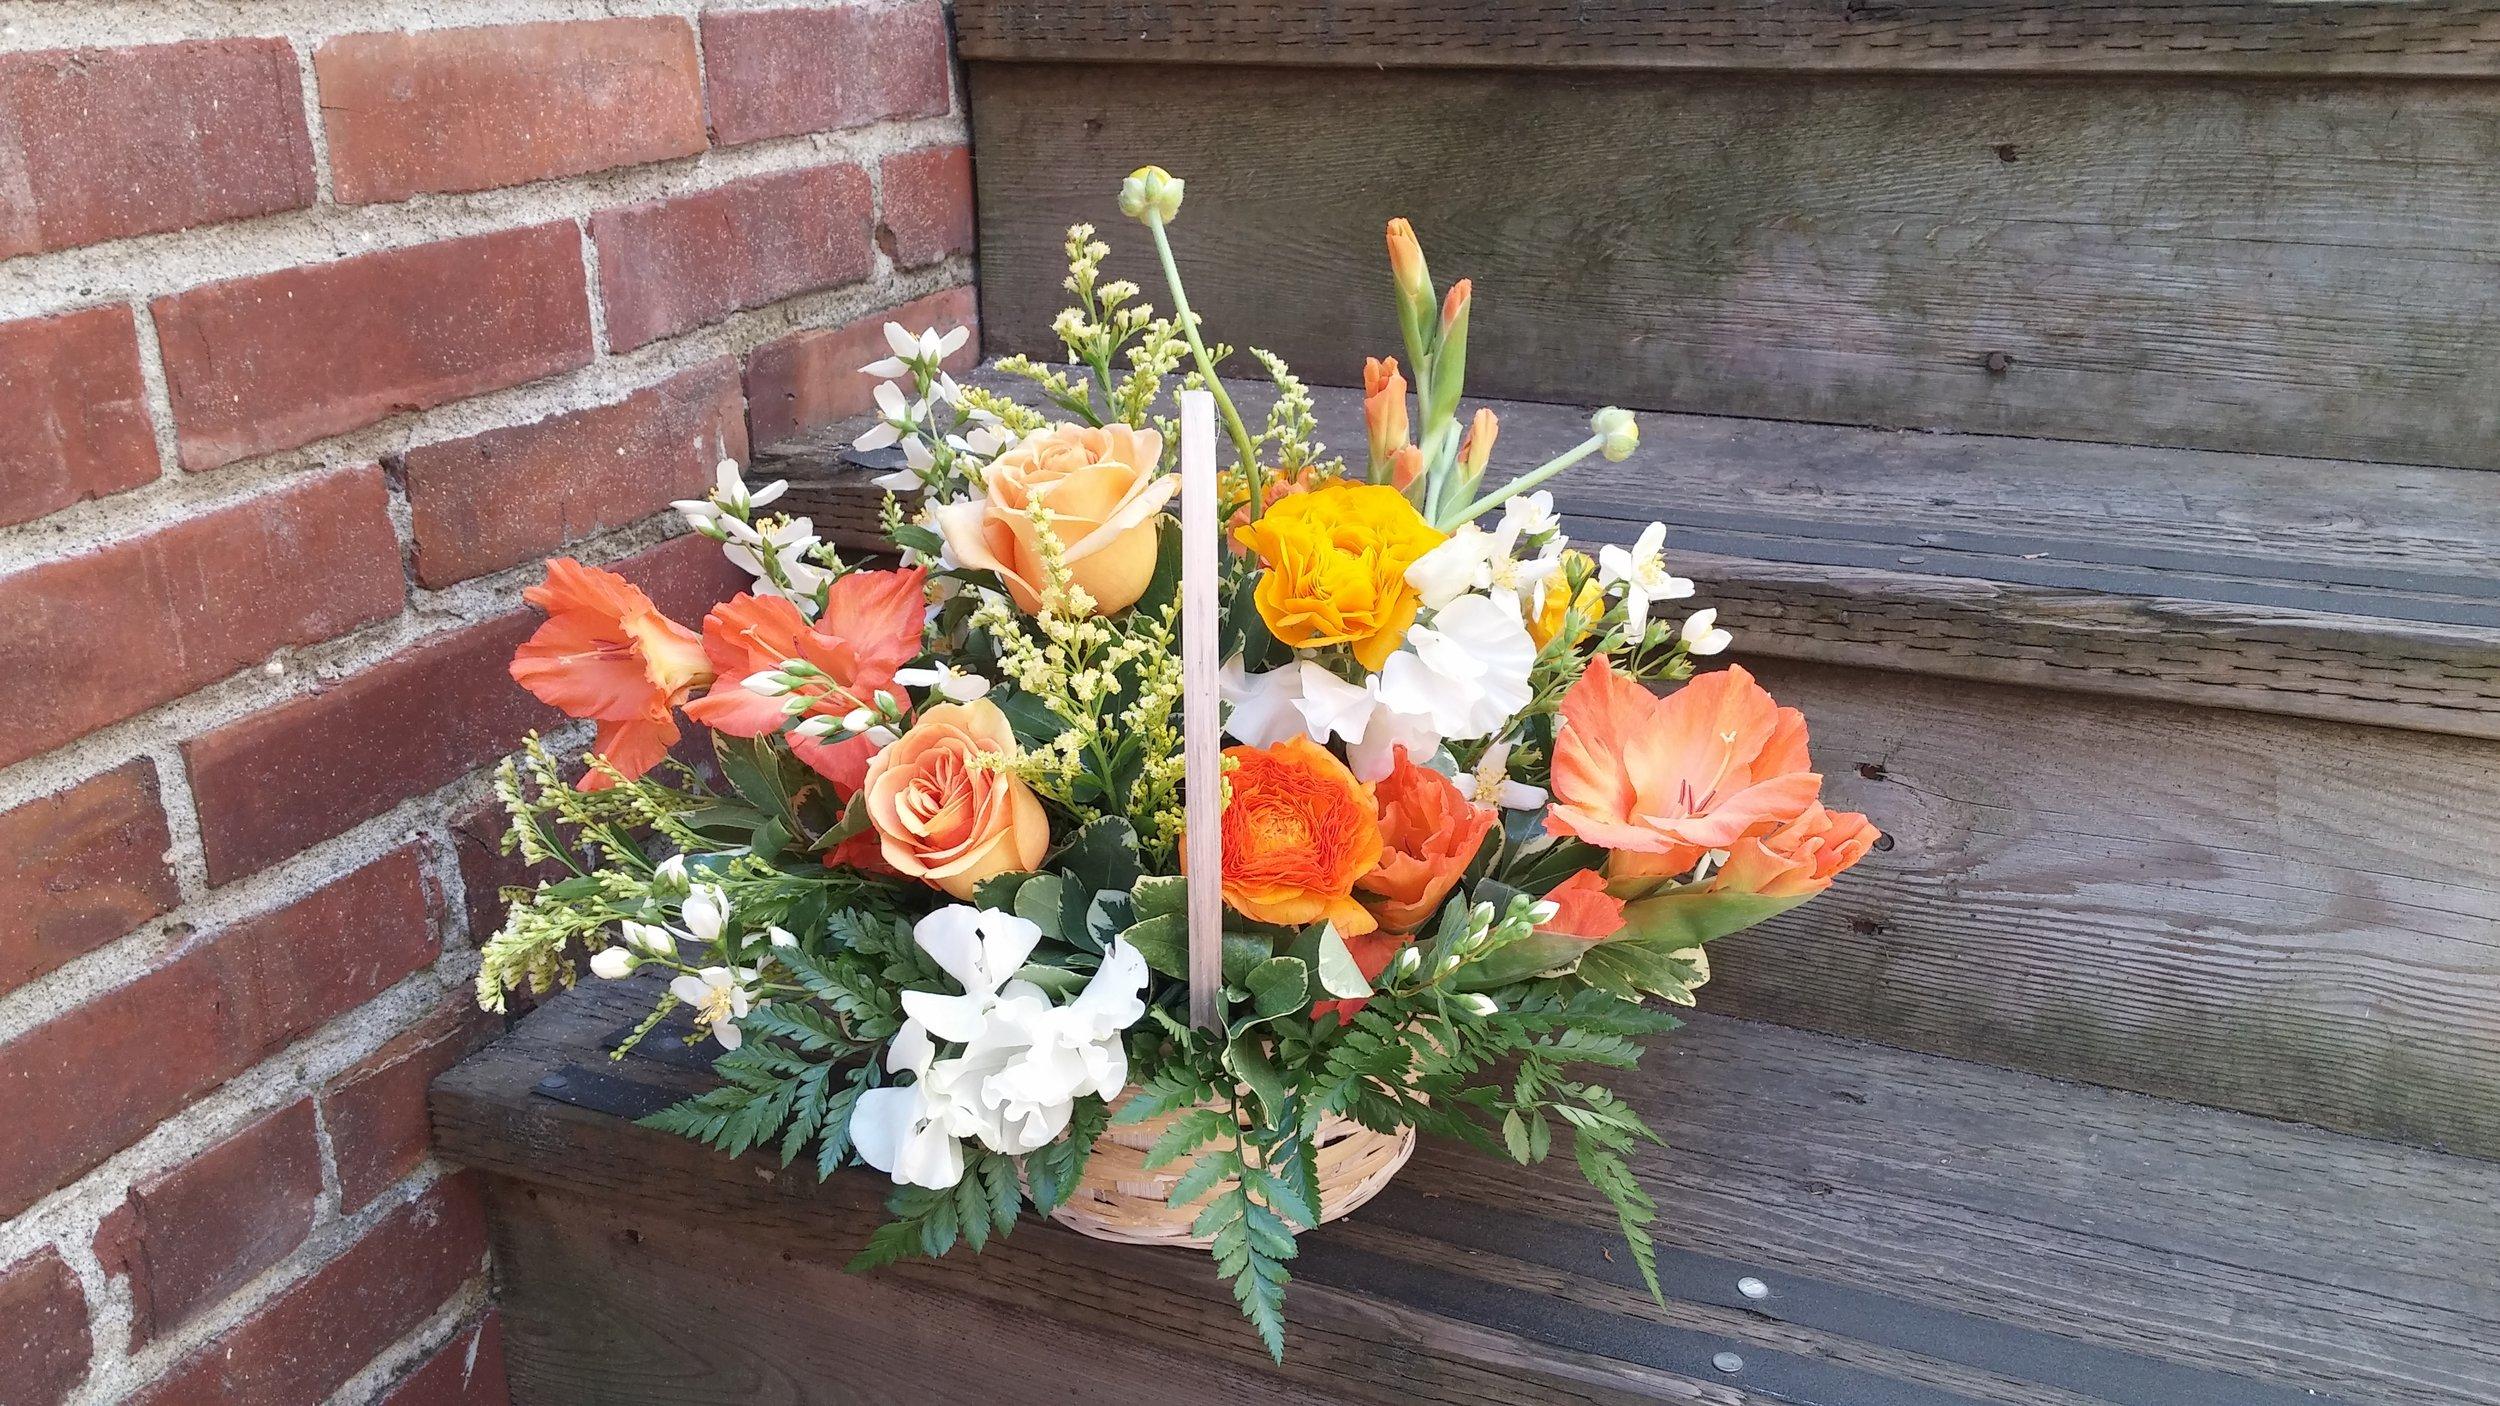 13.  Peach orange and yellow summer basket